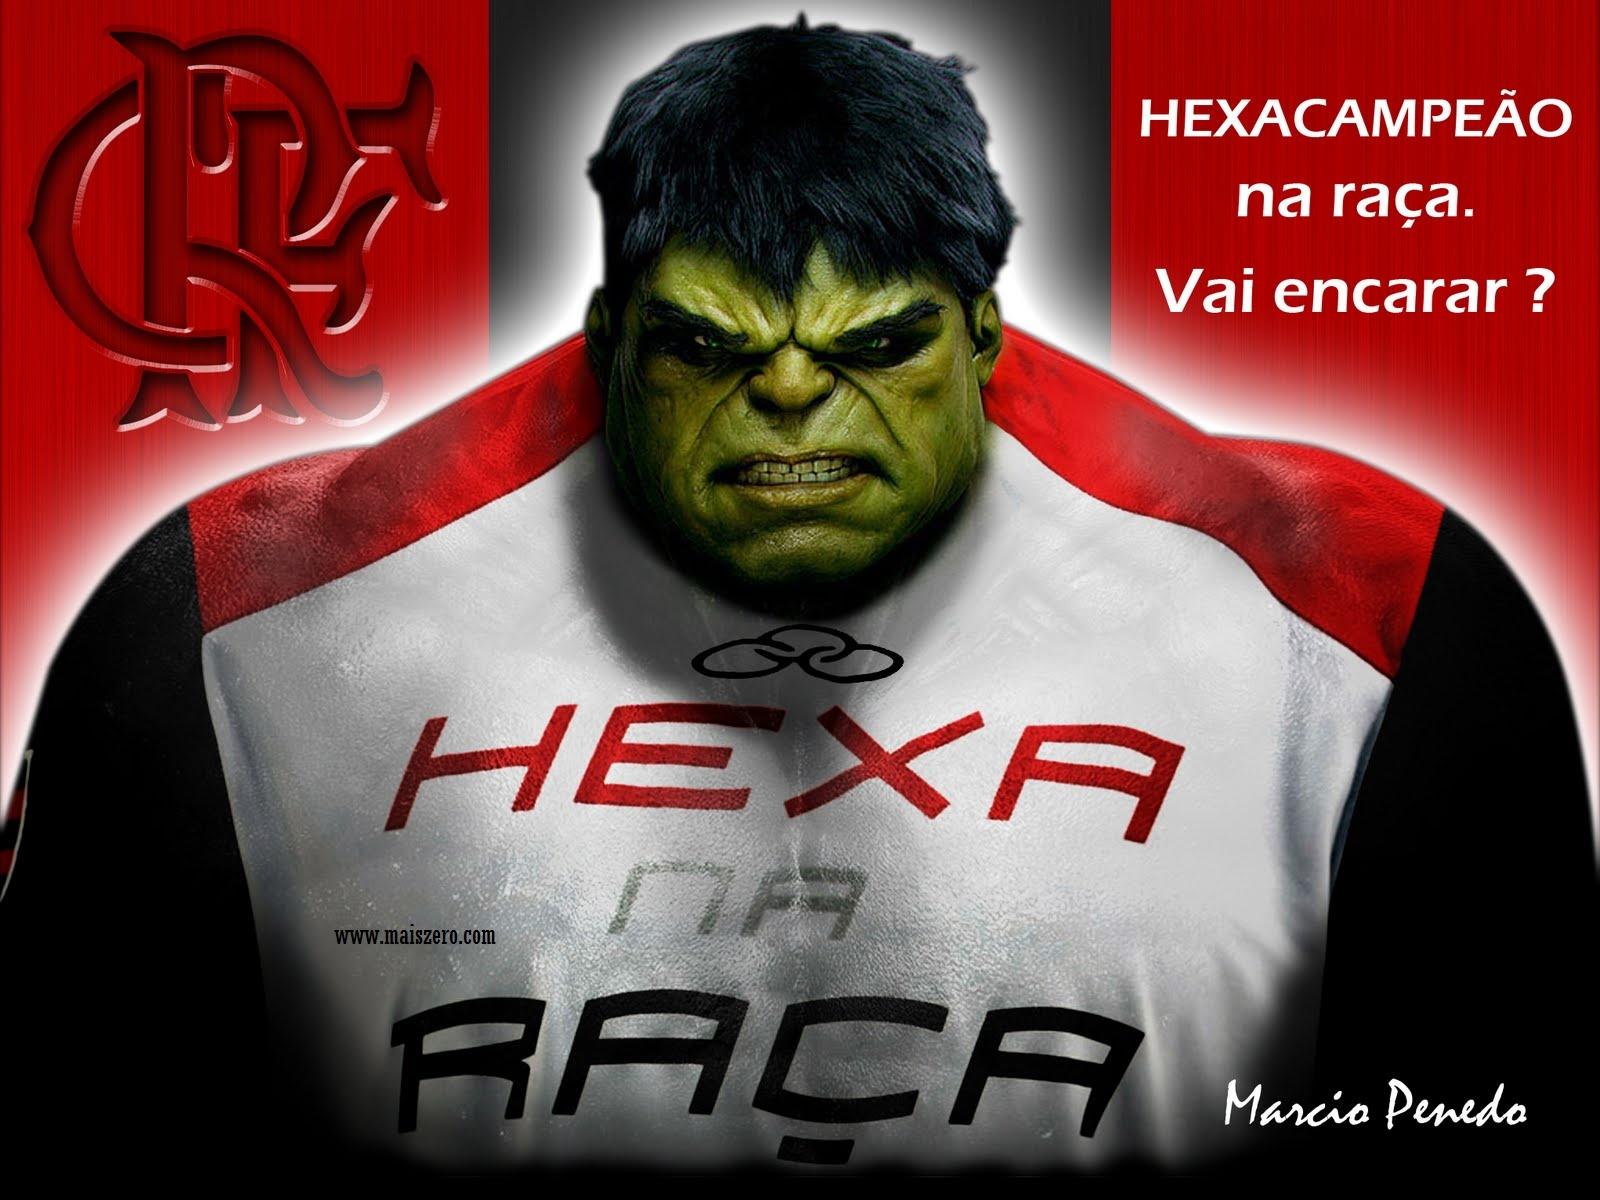 http://2.bp.blogspot.com/-vRZPID4aQT8/Tb7GdXWCvSI/AAAAAAAAA04/ezL4aF9GutA/s1600/72-flamengo-wp-hulk.jpg